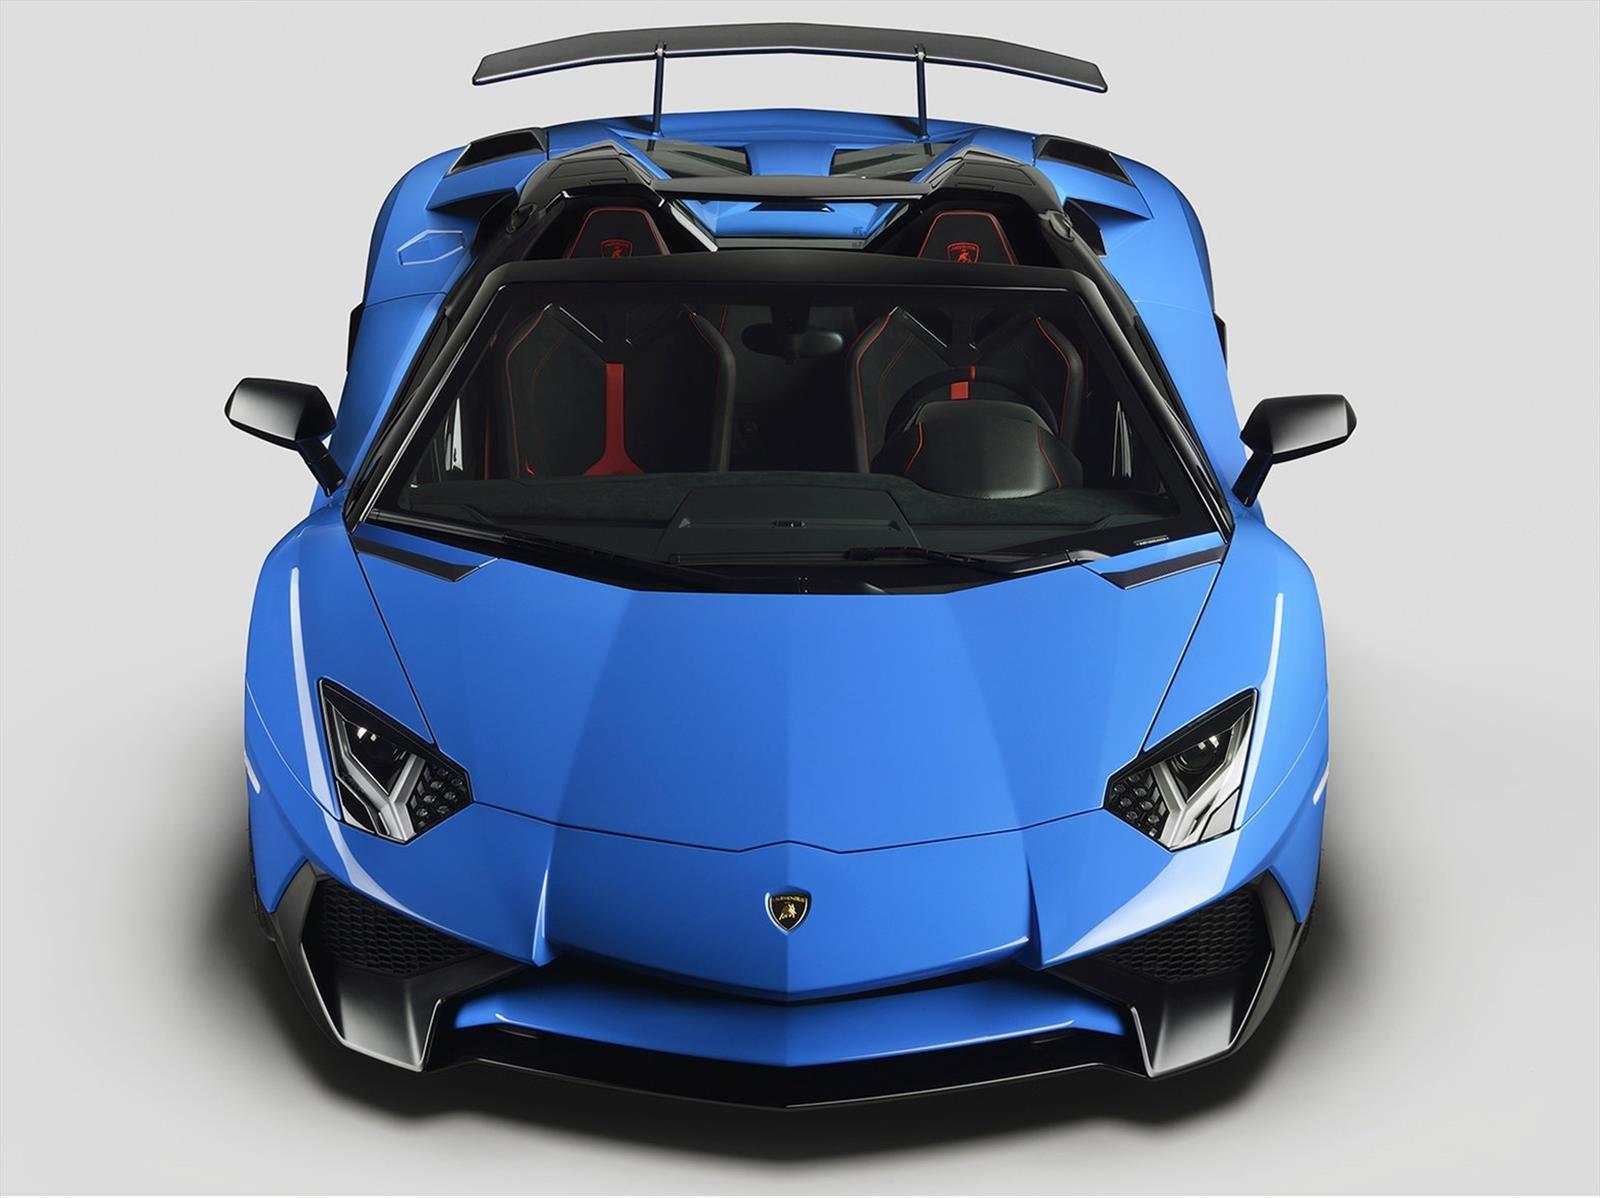 Lamborghini mantiene sus números en alza